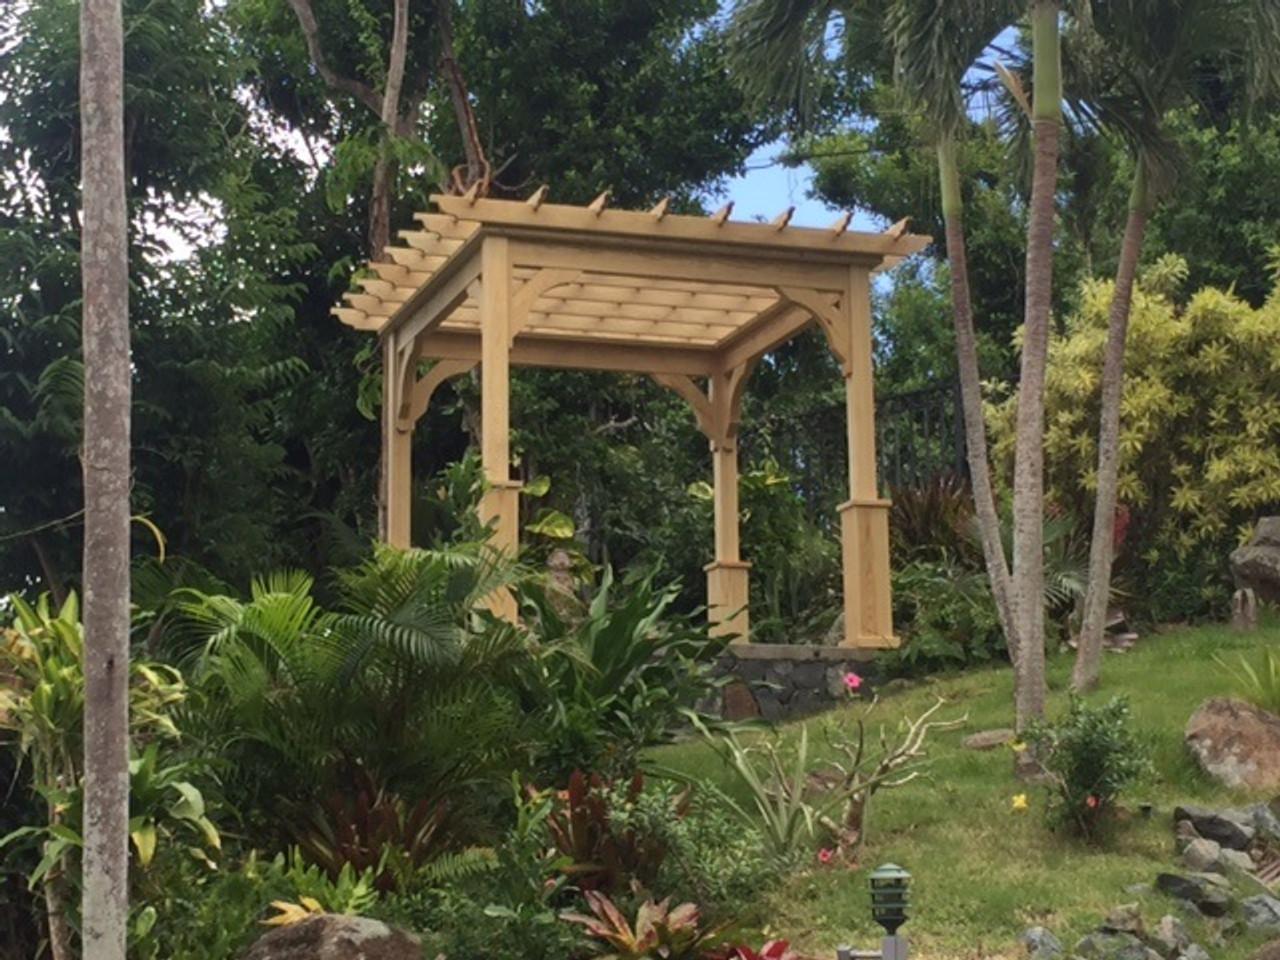 10x10 Pressure Treated Pine Serenity Pergola Kit, U.S. Virgin Islands